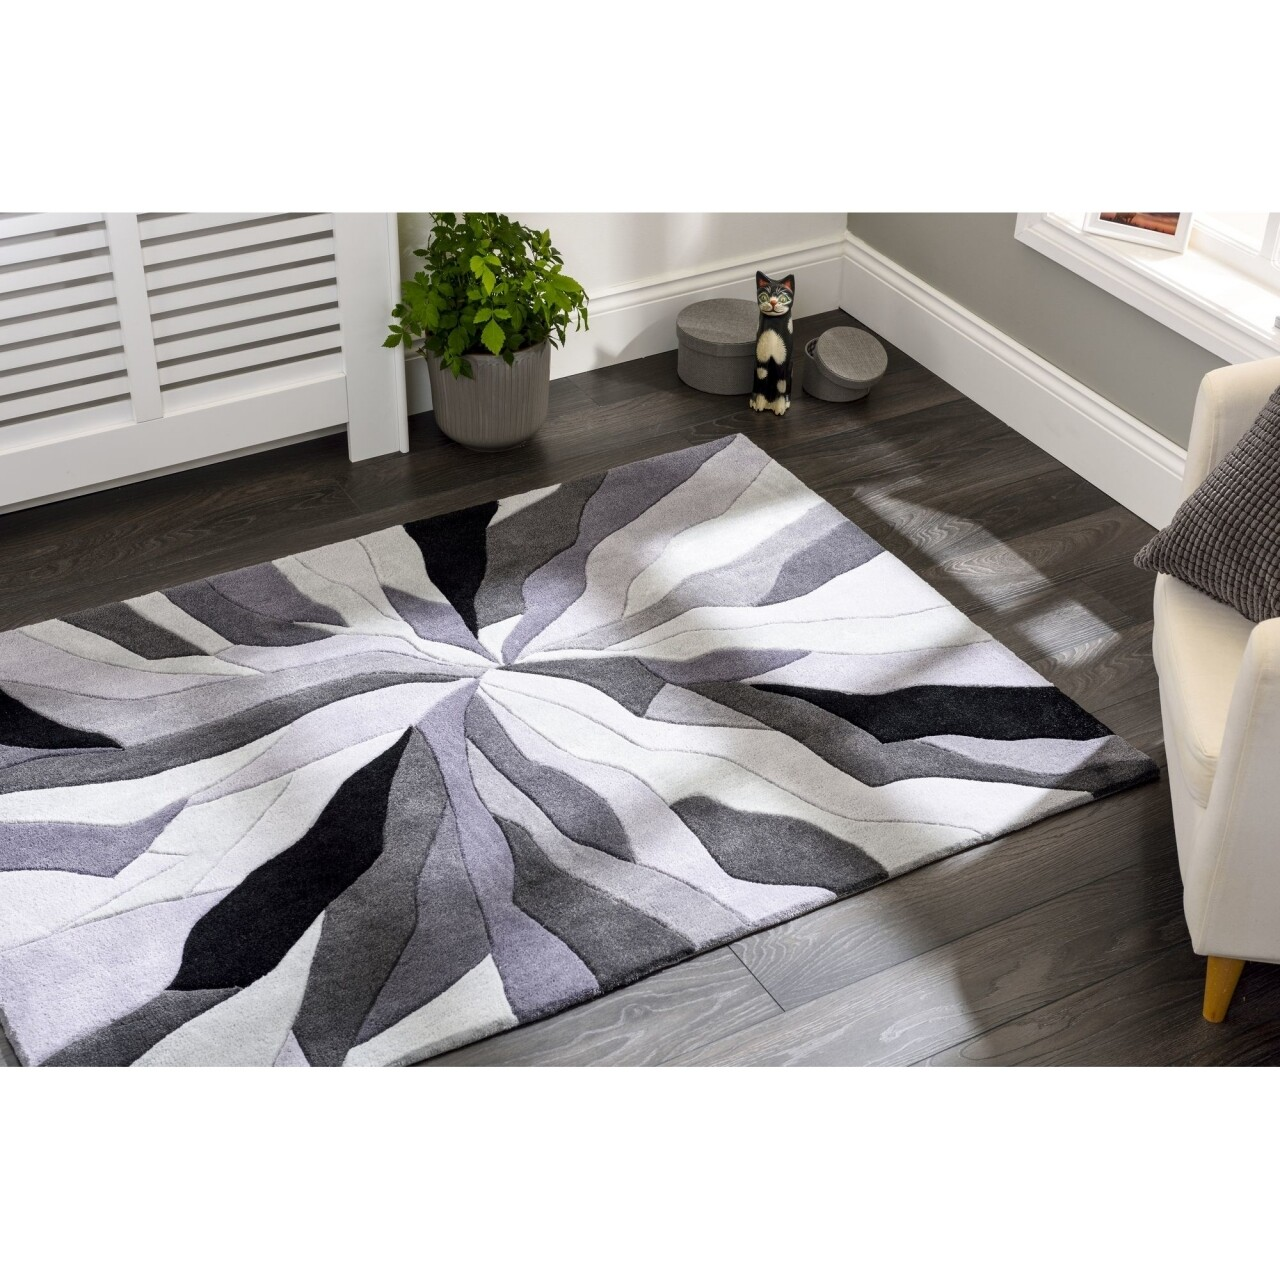 Covor Infinite Splinter Grey, Flair Rugs, 160 x 220 cm, 100% poliester, gri